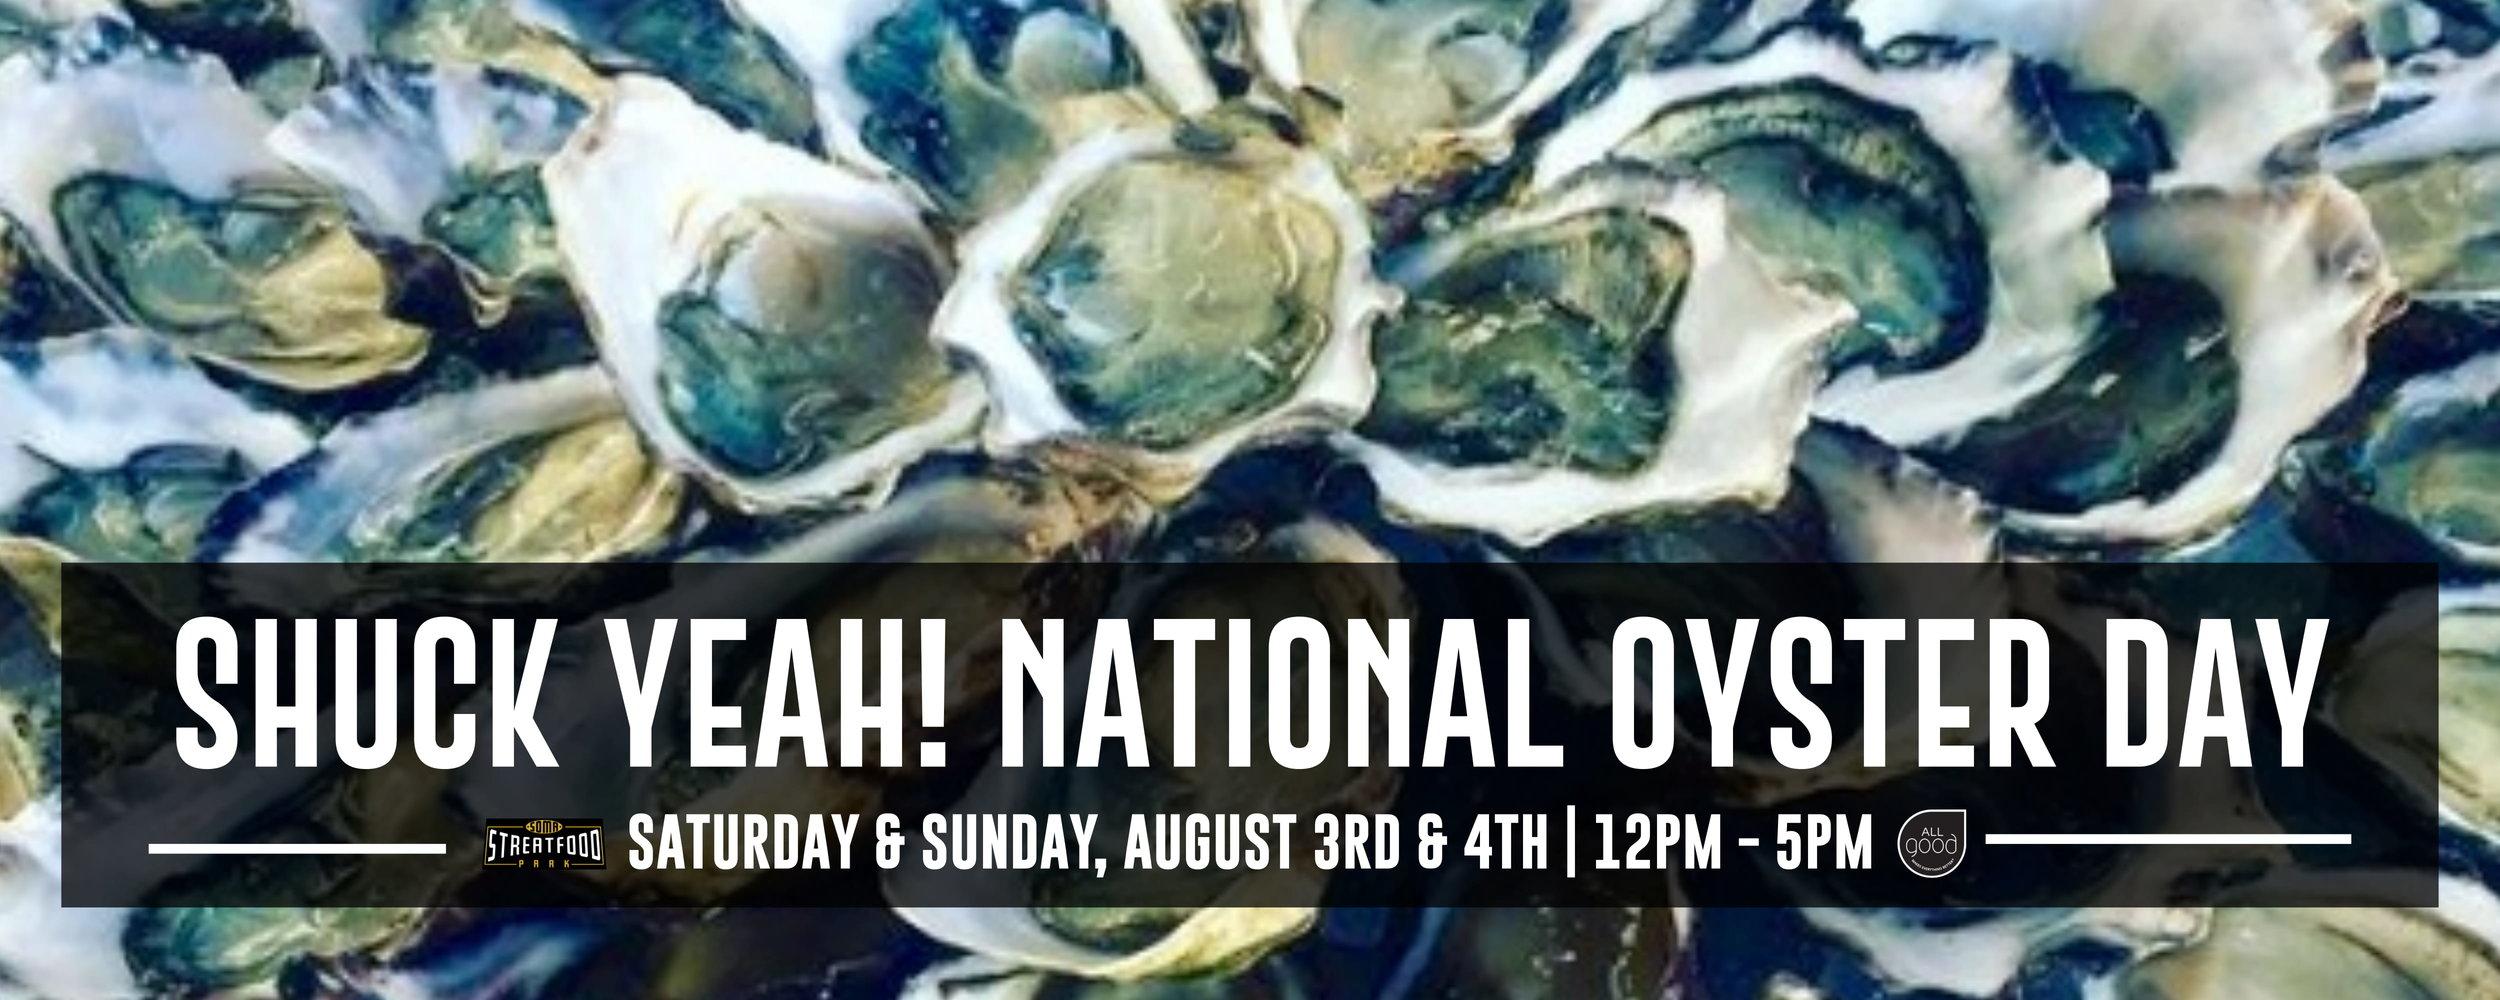 oyster cover 2-1.jpg